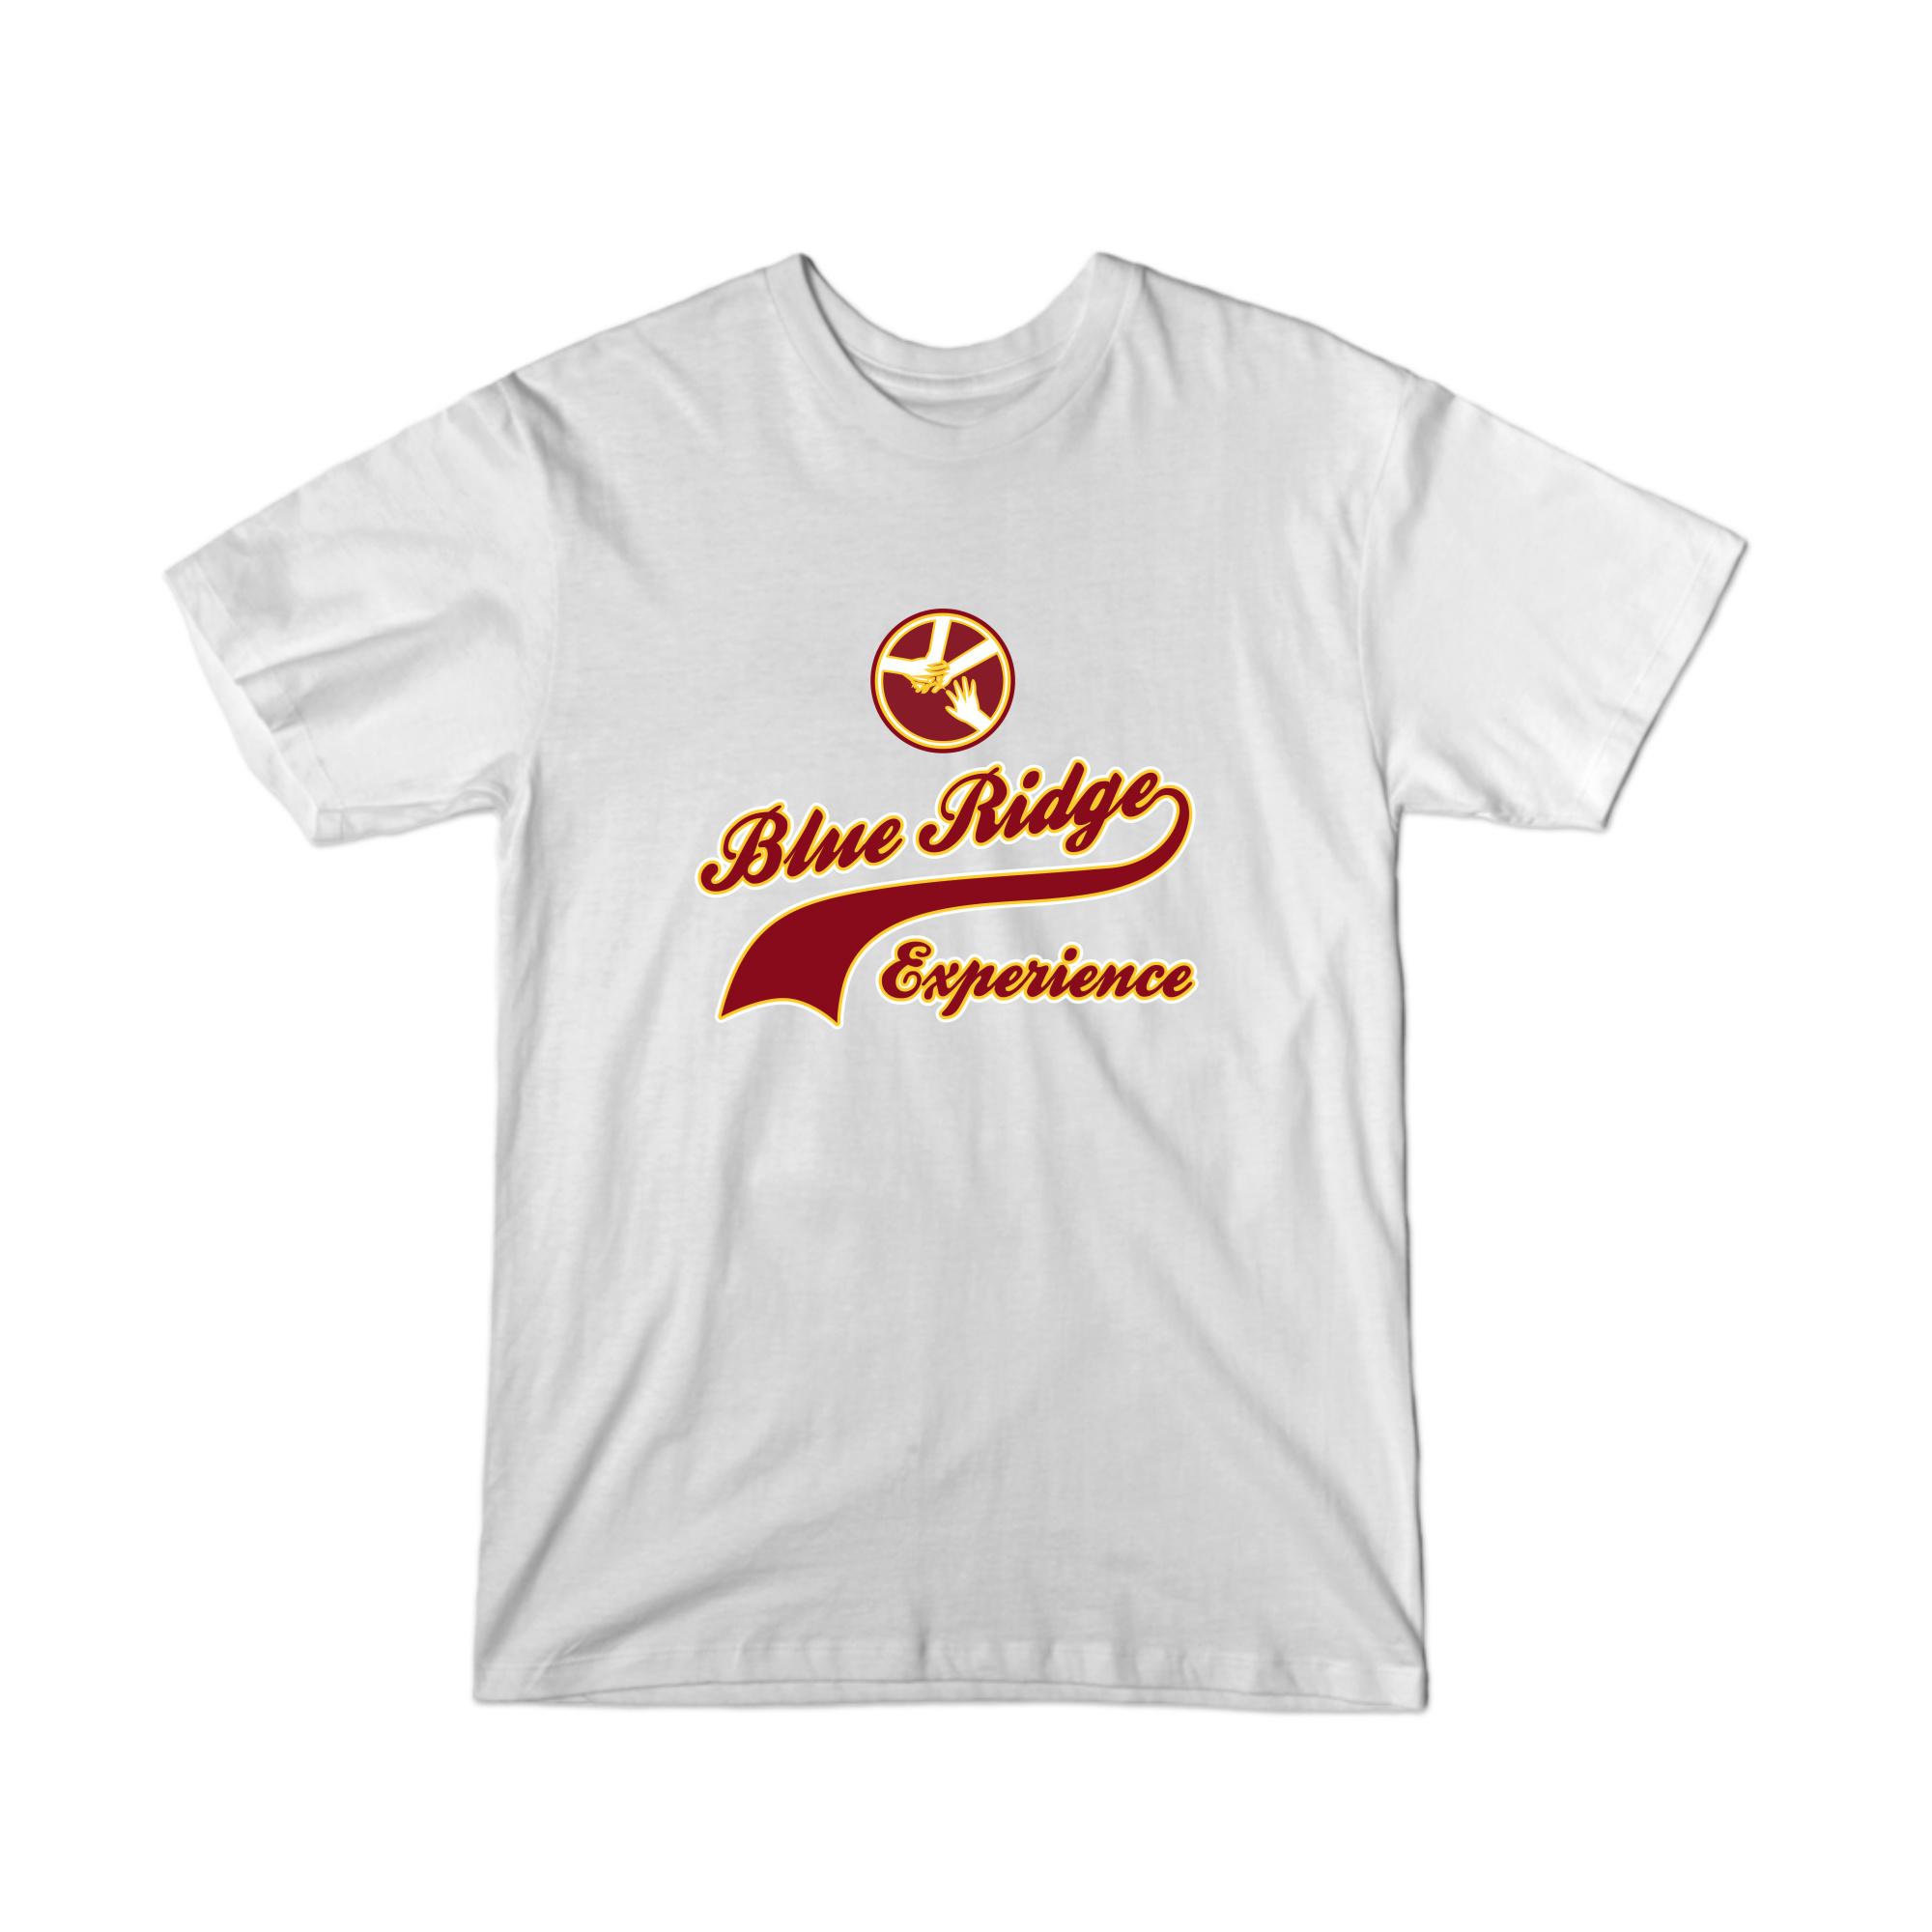 Blue Ridge Maroon & Gold T-Shirt